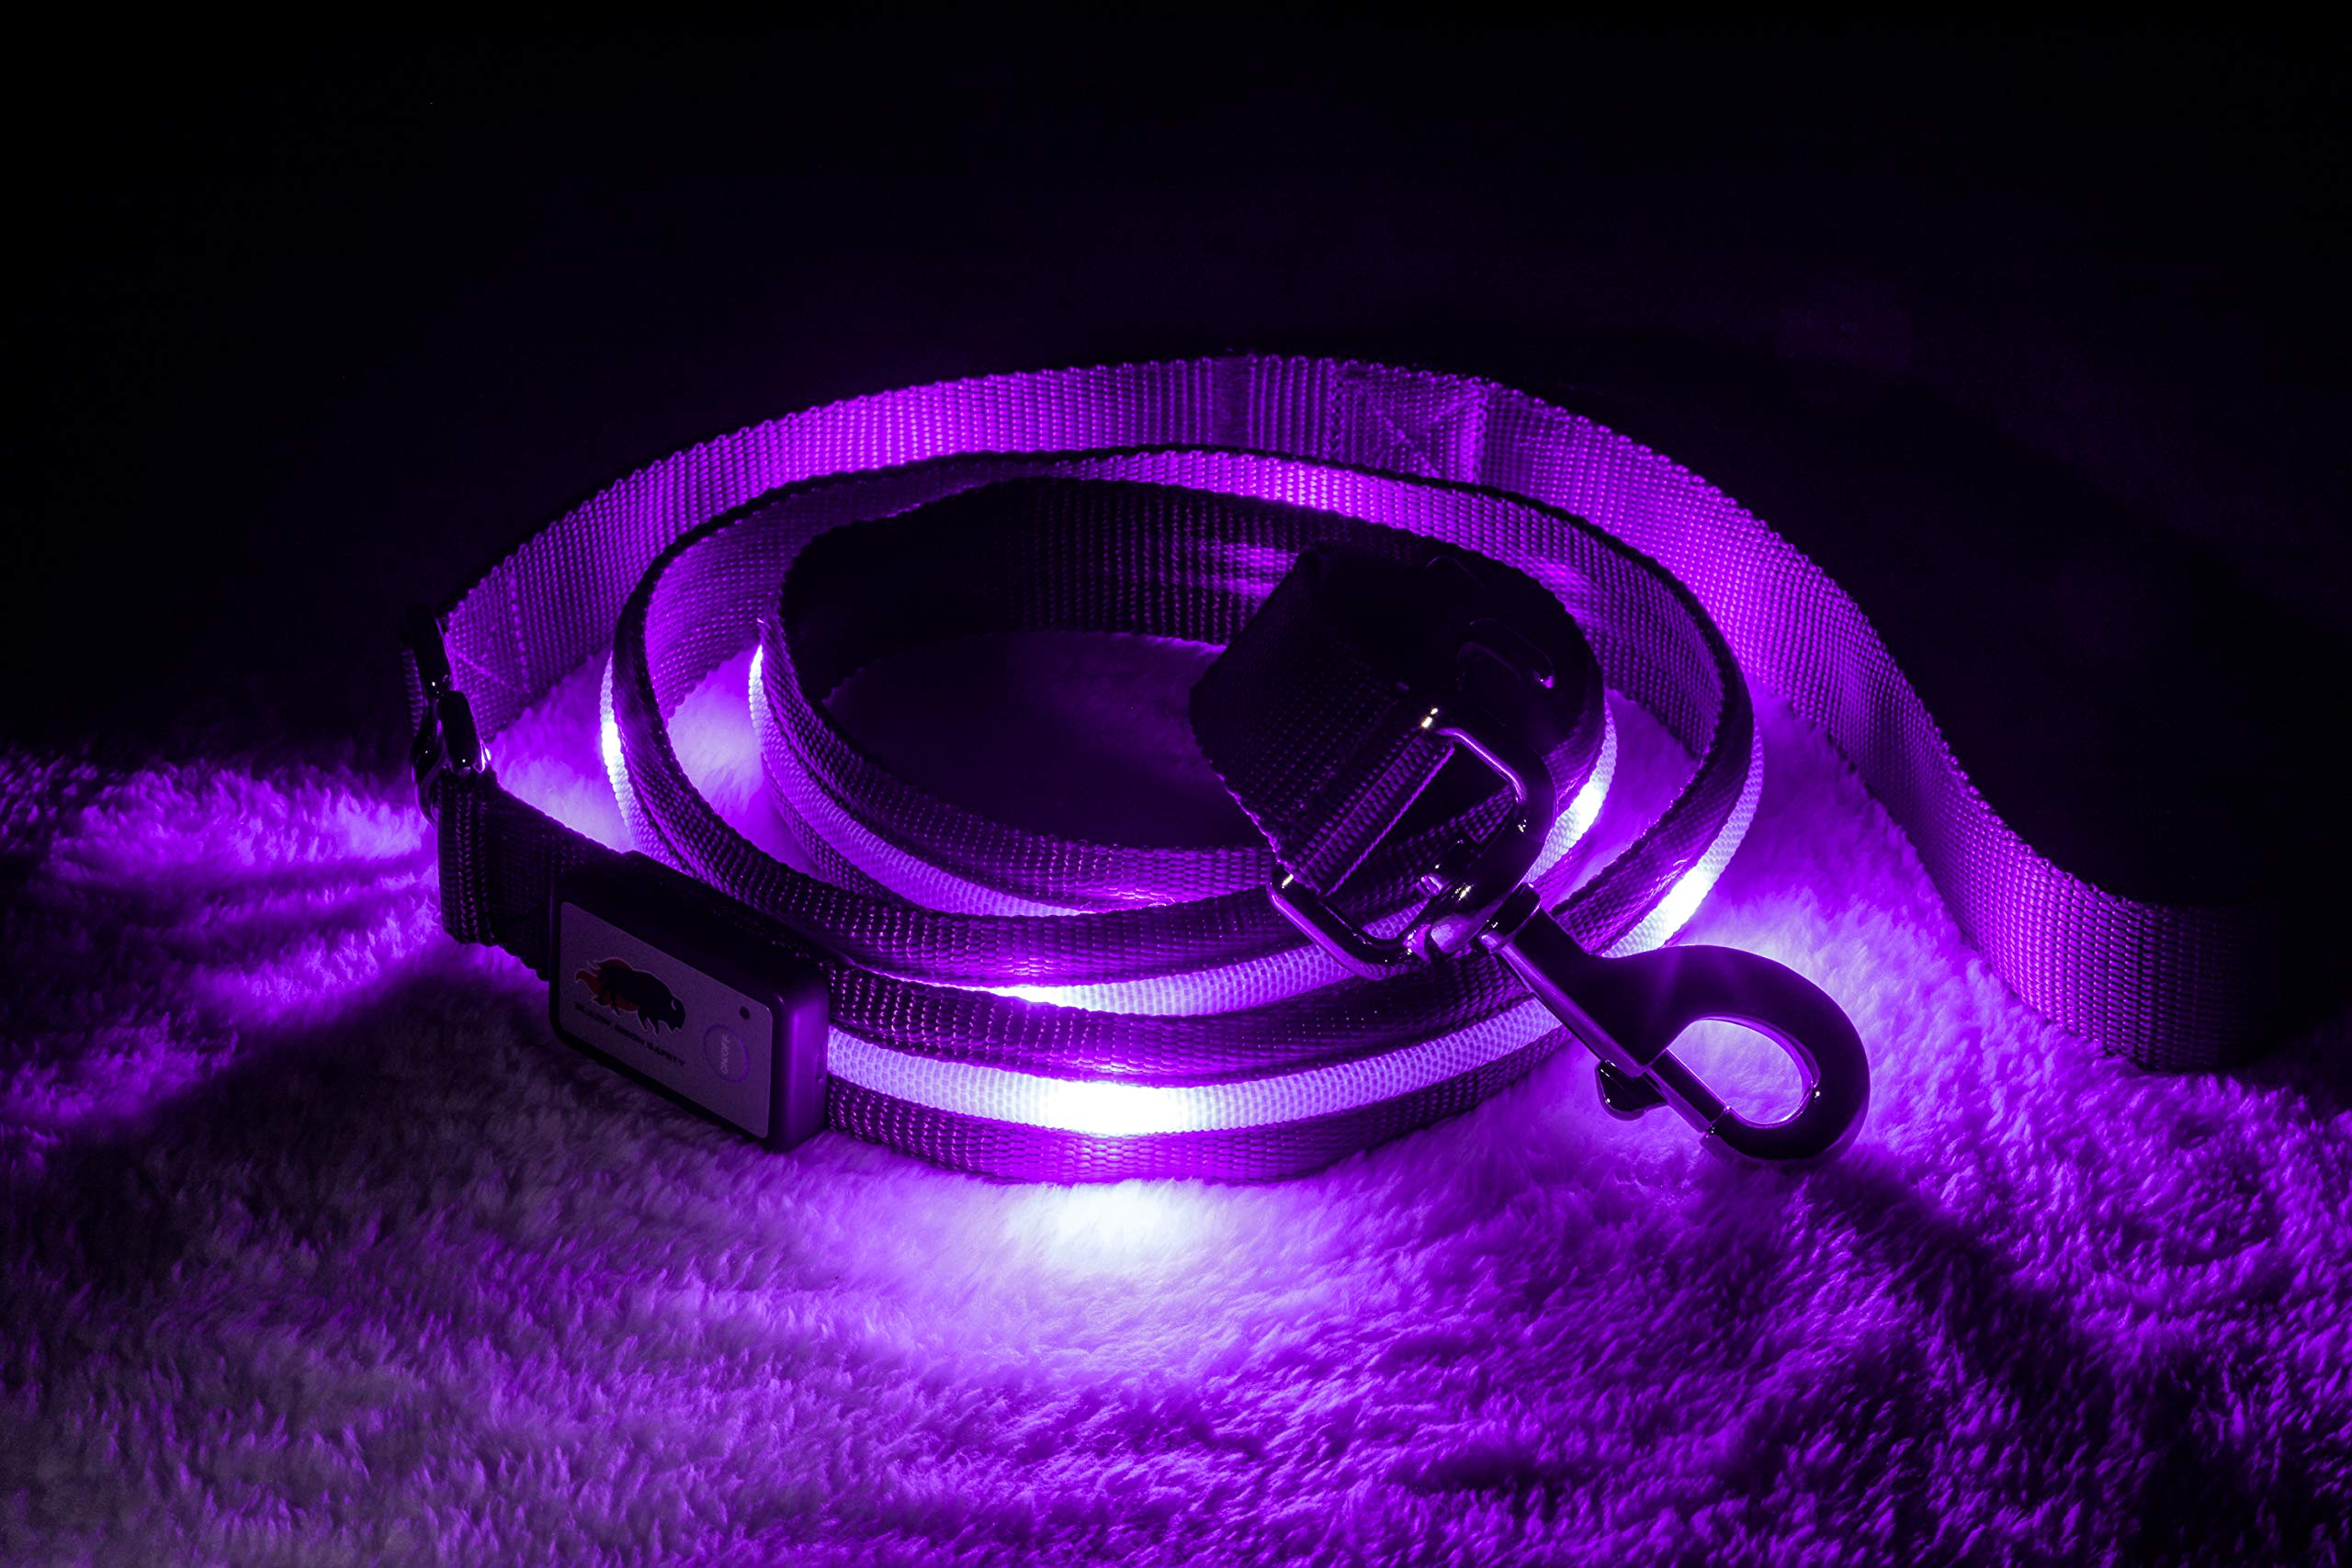 Blazin' Safety LED Dog Leash - USB Rechargeable Flashing Light, 6 Ft, Water Resistant - Avoid Danger - Purple by Blazin' Bison